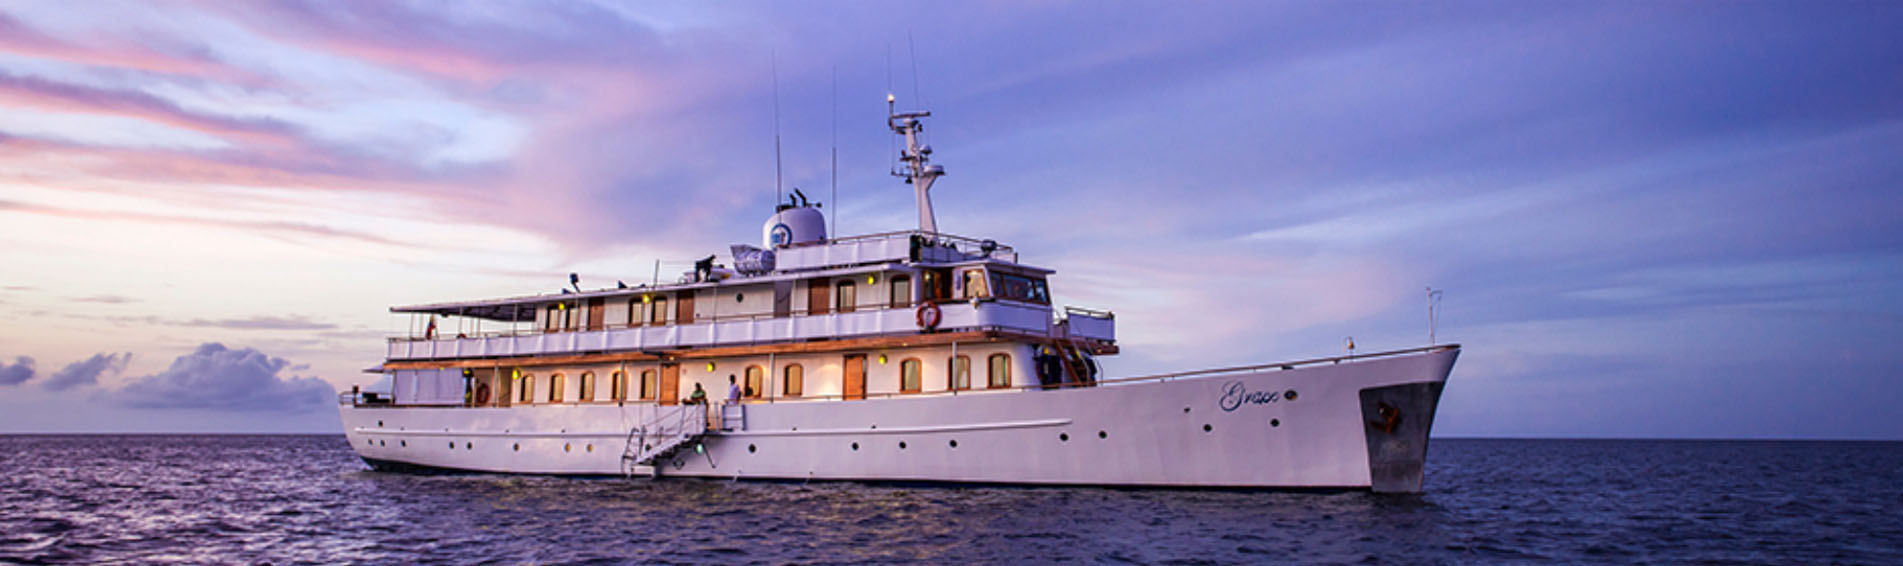 GRACE Galapagos cruise profile